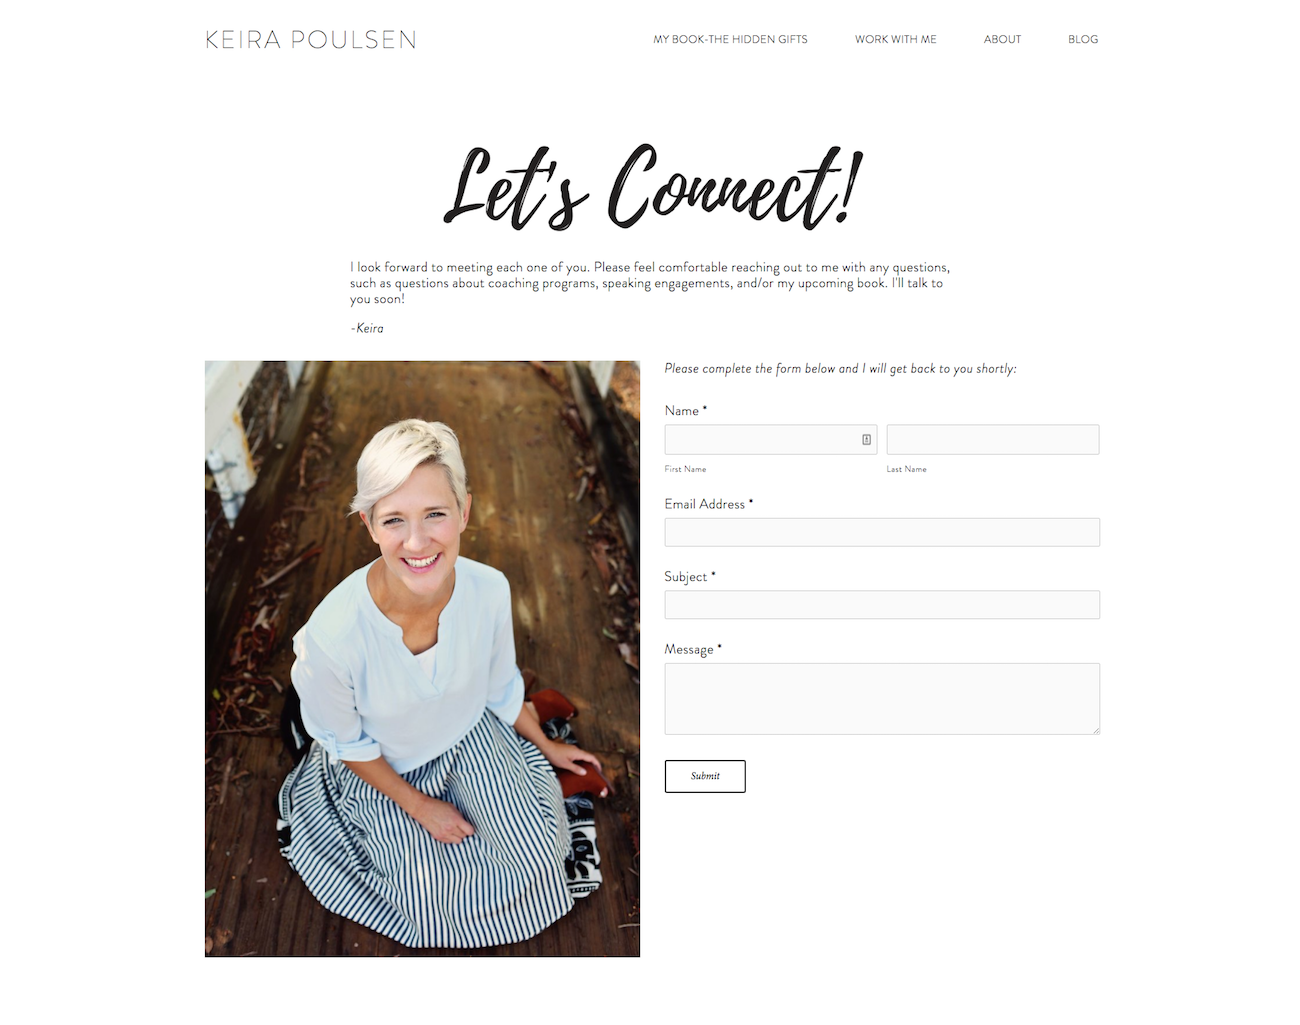 keira-poulsen-website-a6.png